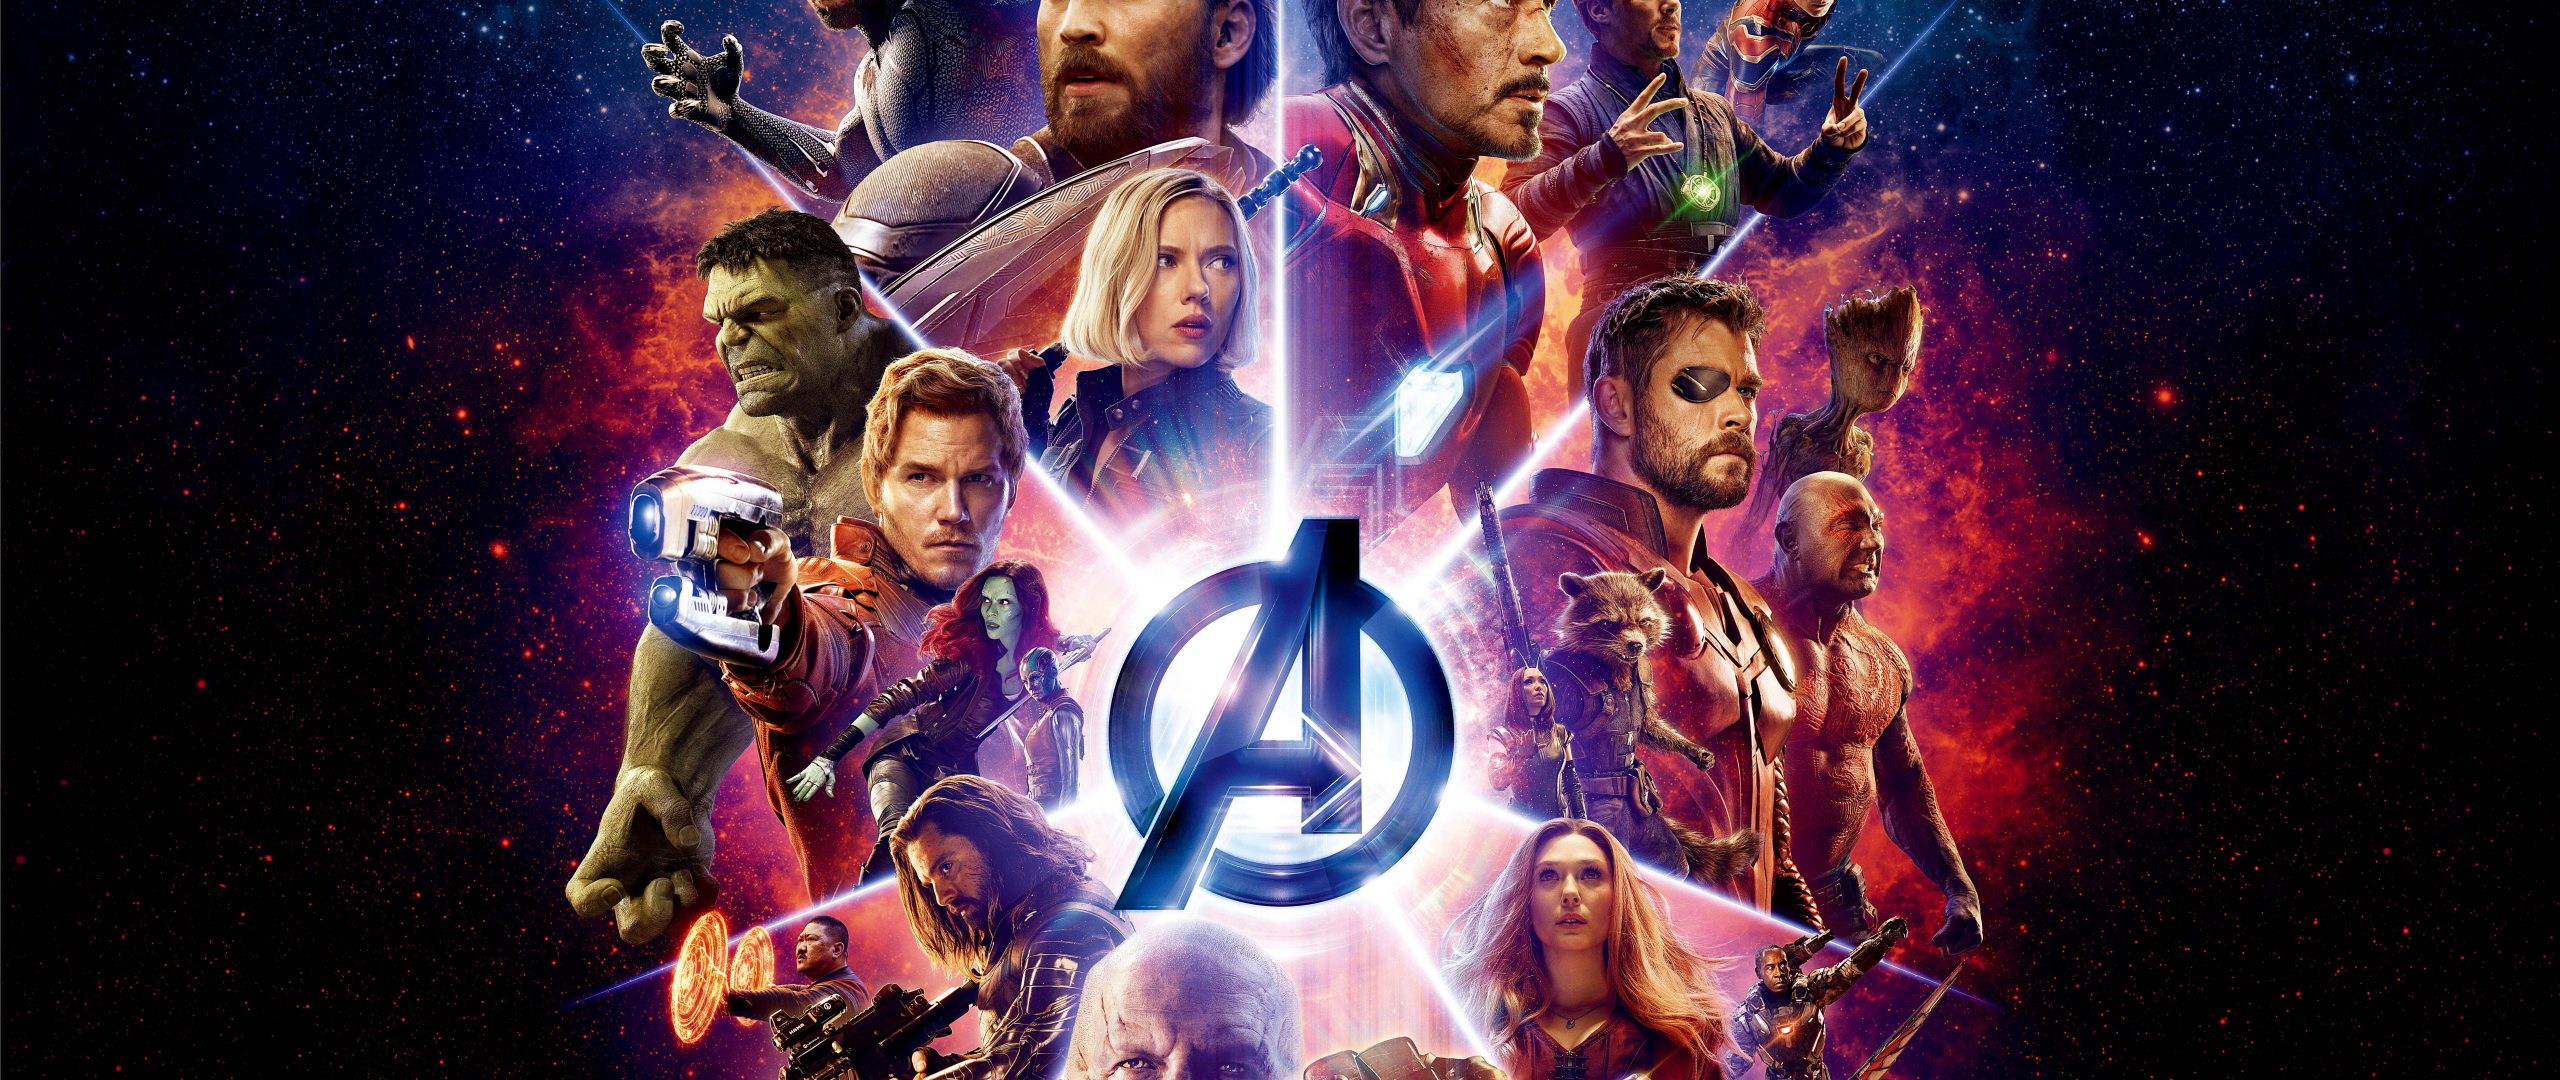 Avengers Infinity War Poster 8k Wallpaper Best Wallpapers